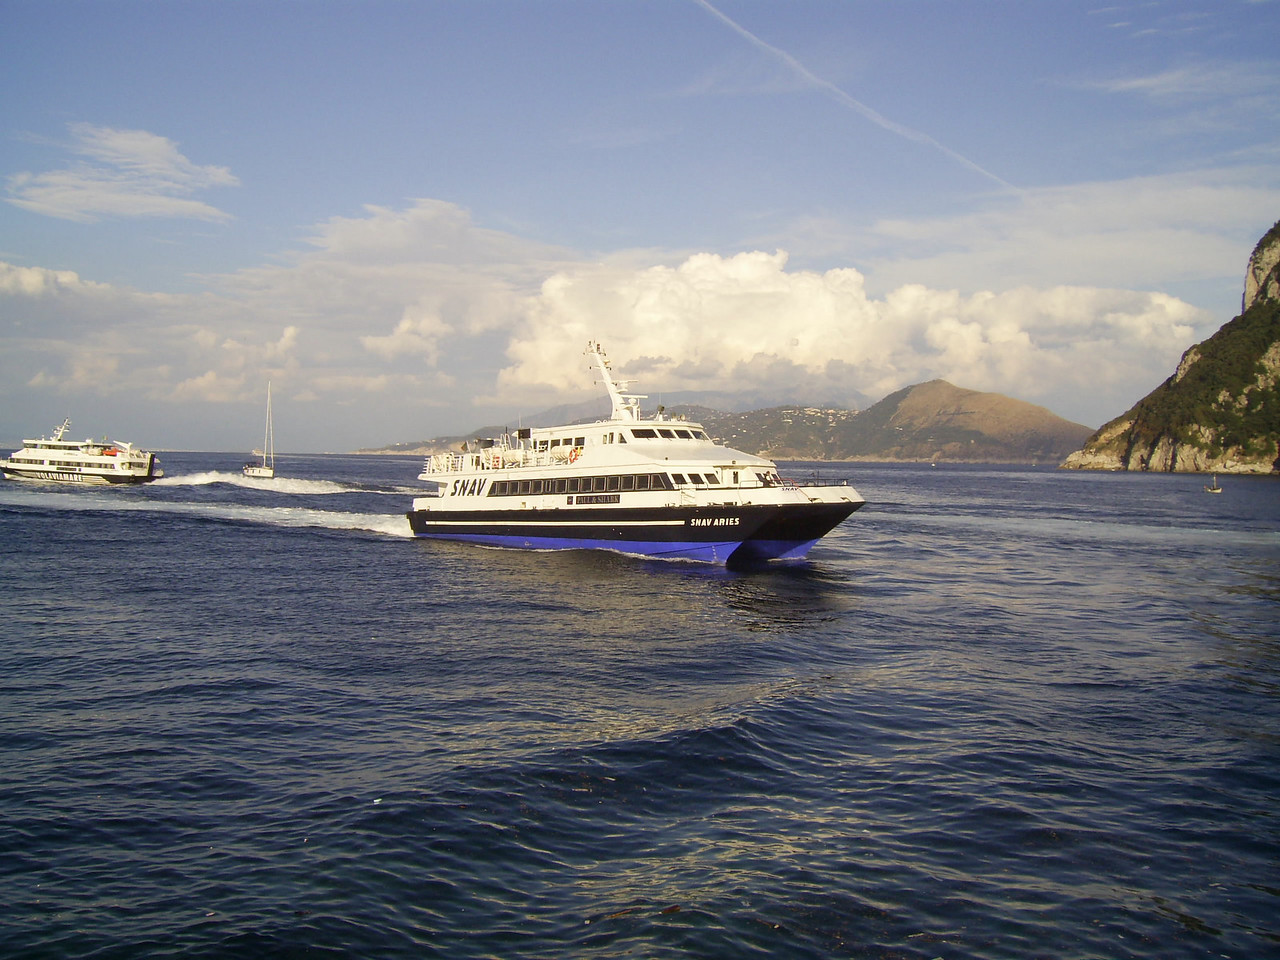 2007 - SNAV ARIES arriving to Capri.